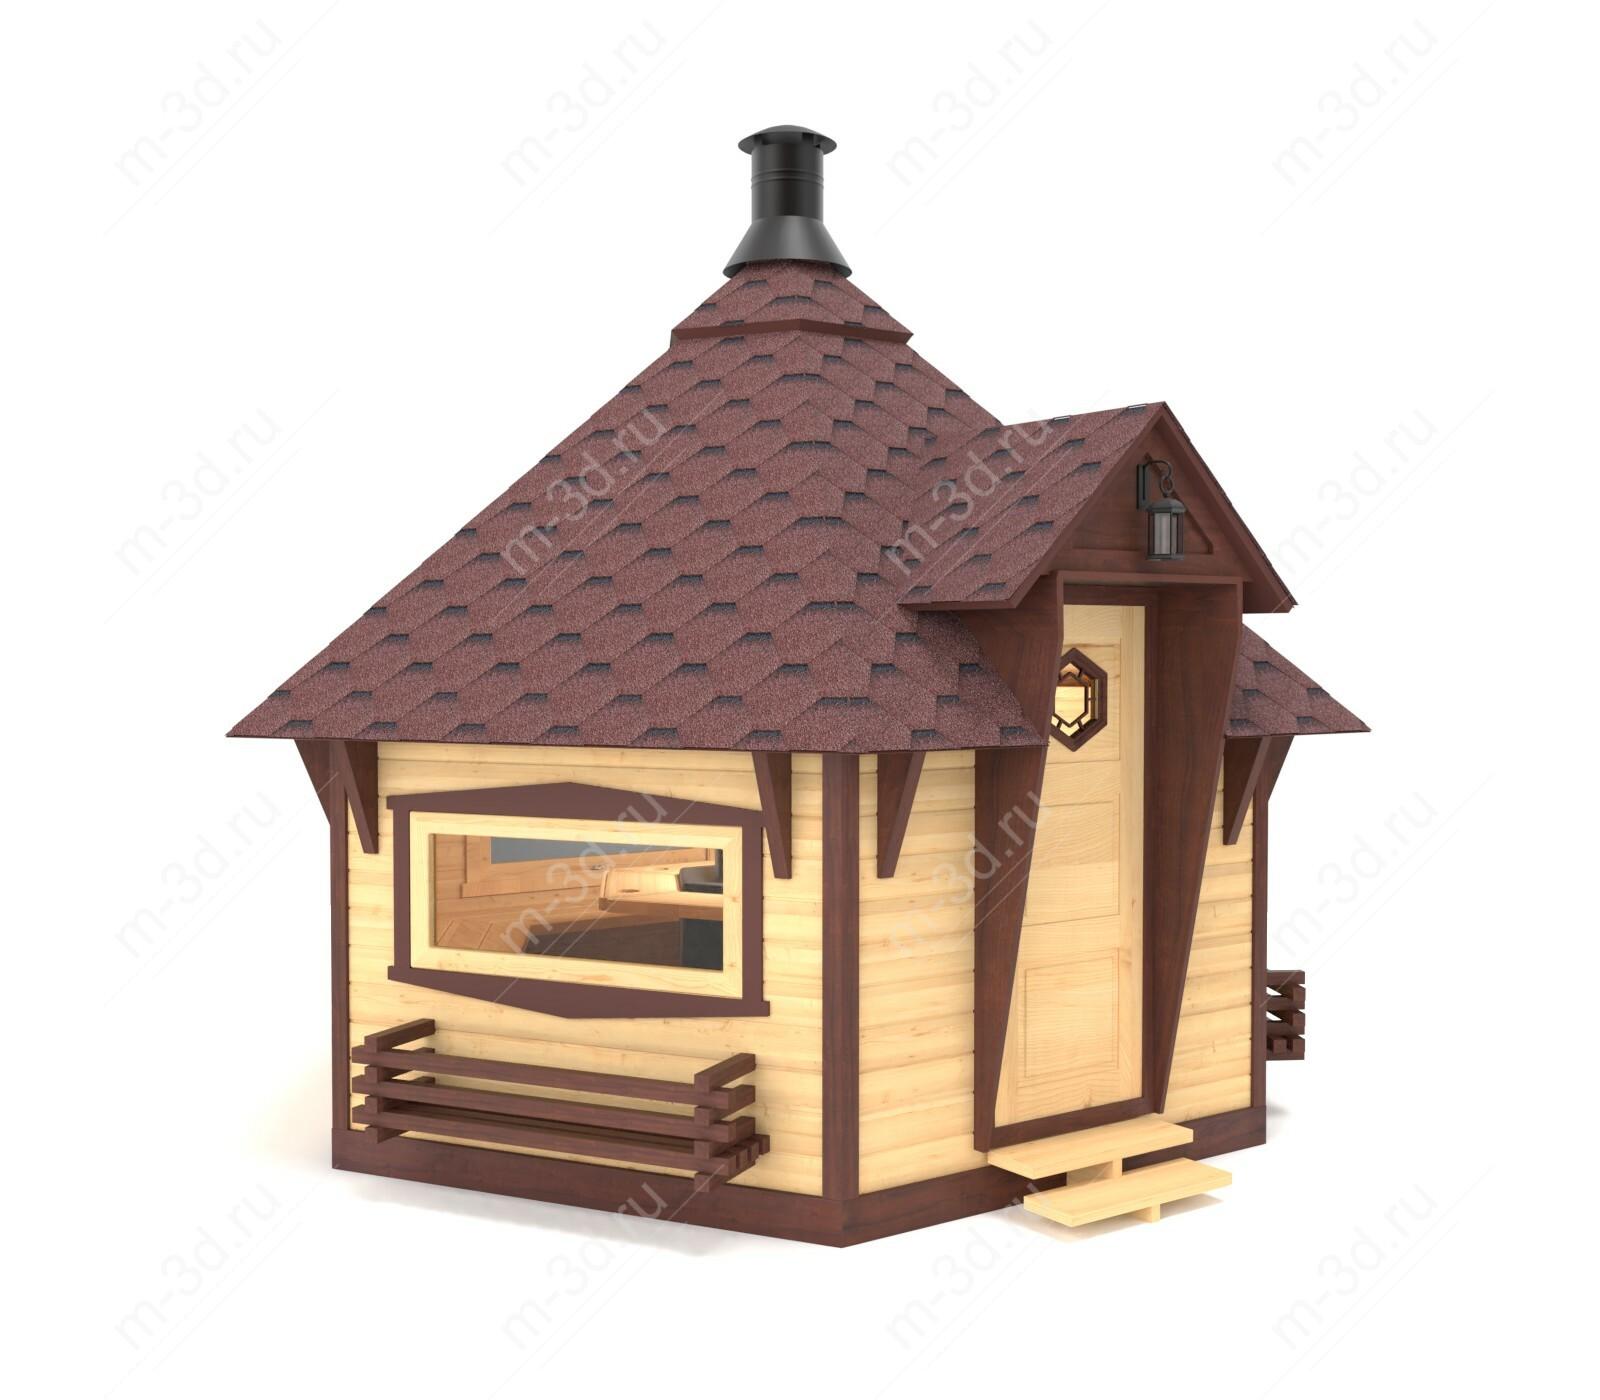 домик для пикника